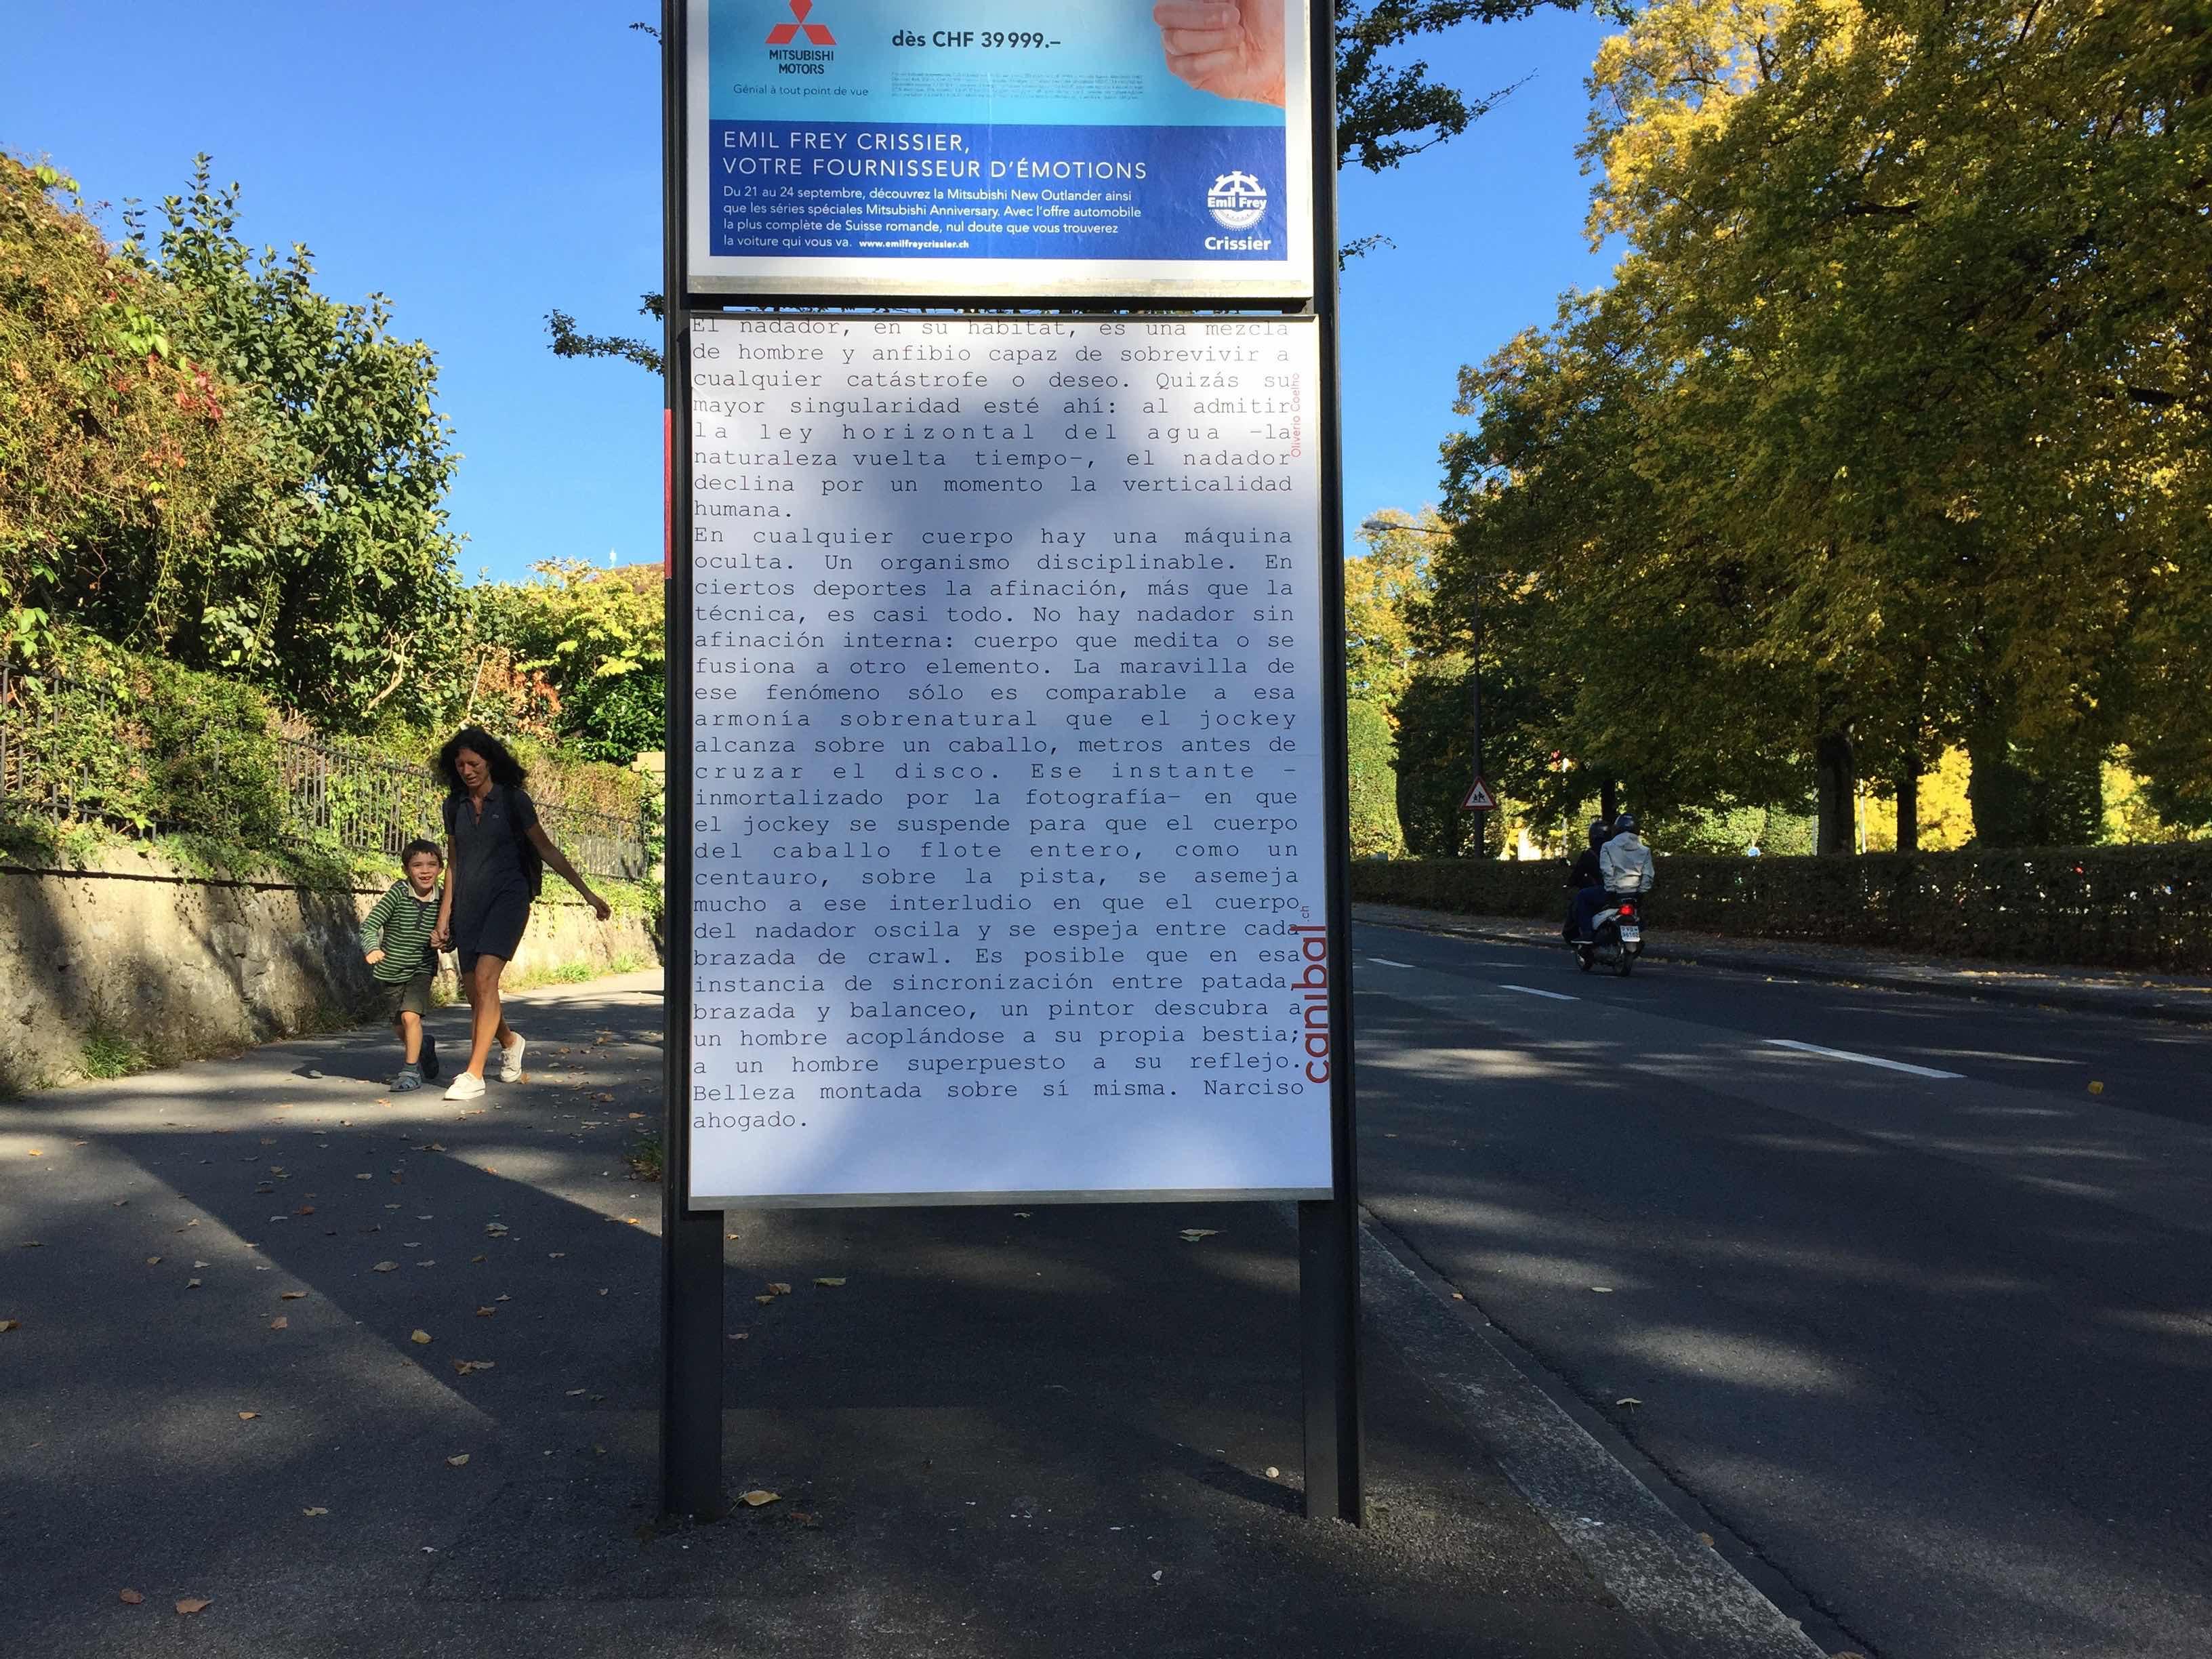 Oliverio Coelho, avenue de milan 10, Lausanne-IMG_5834